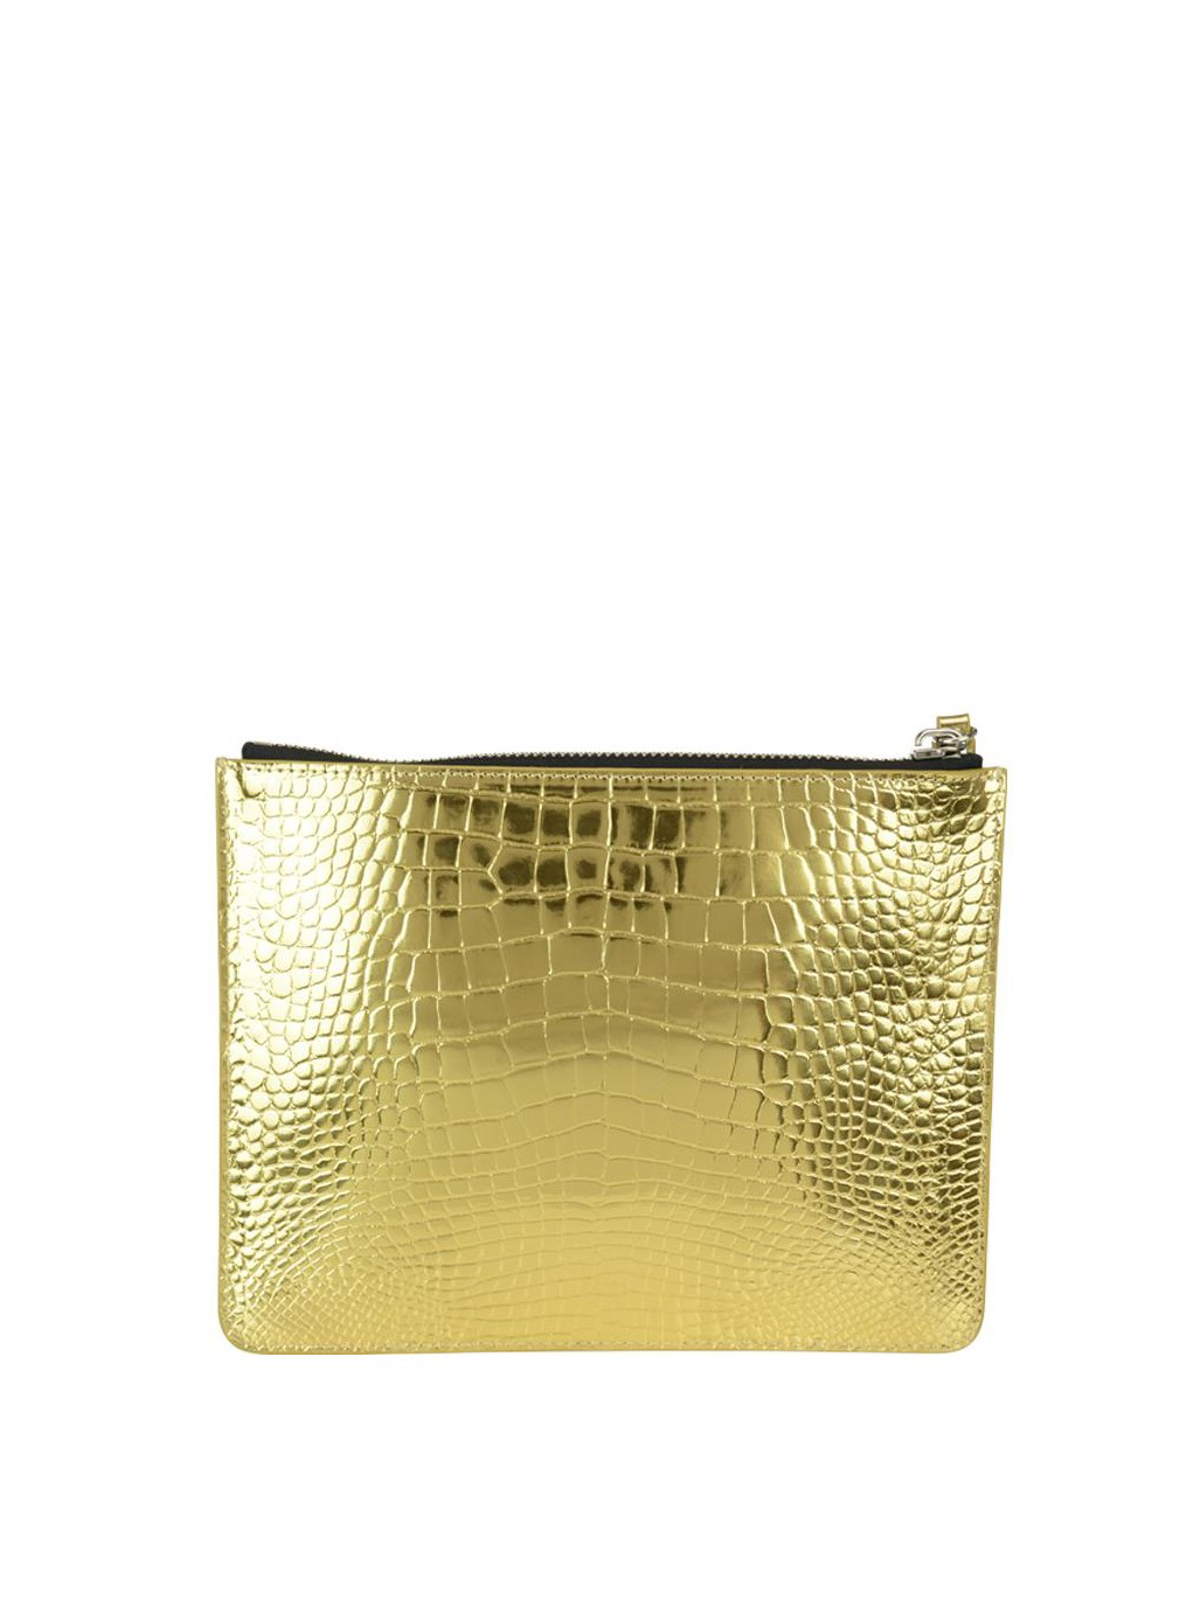 Giuseppe Zanotti Gold croco print leather pouch 1GYbLDbK1s